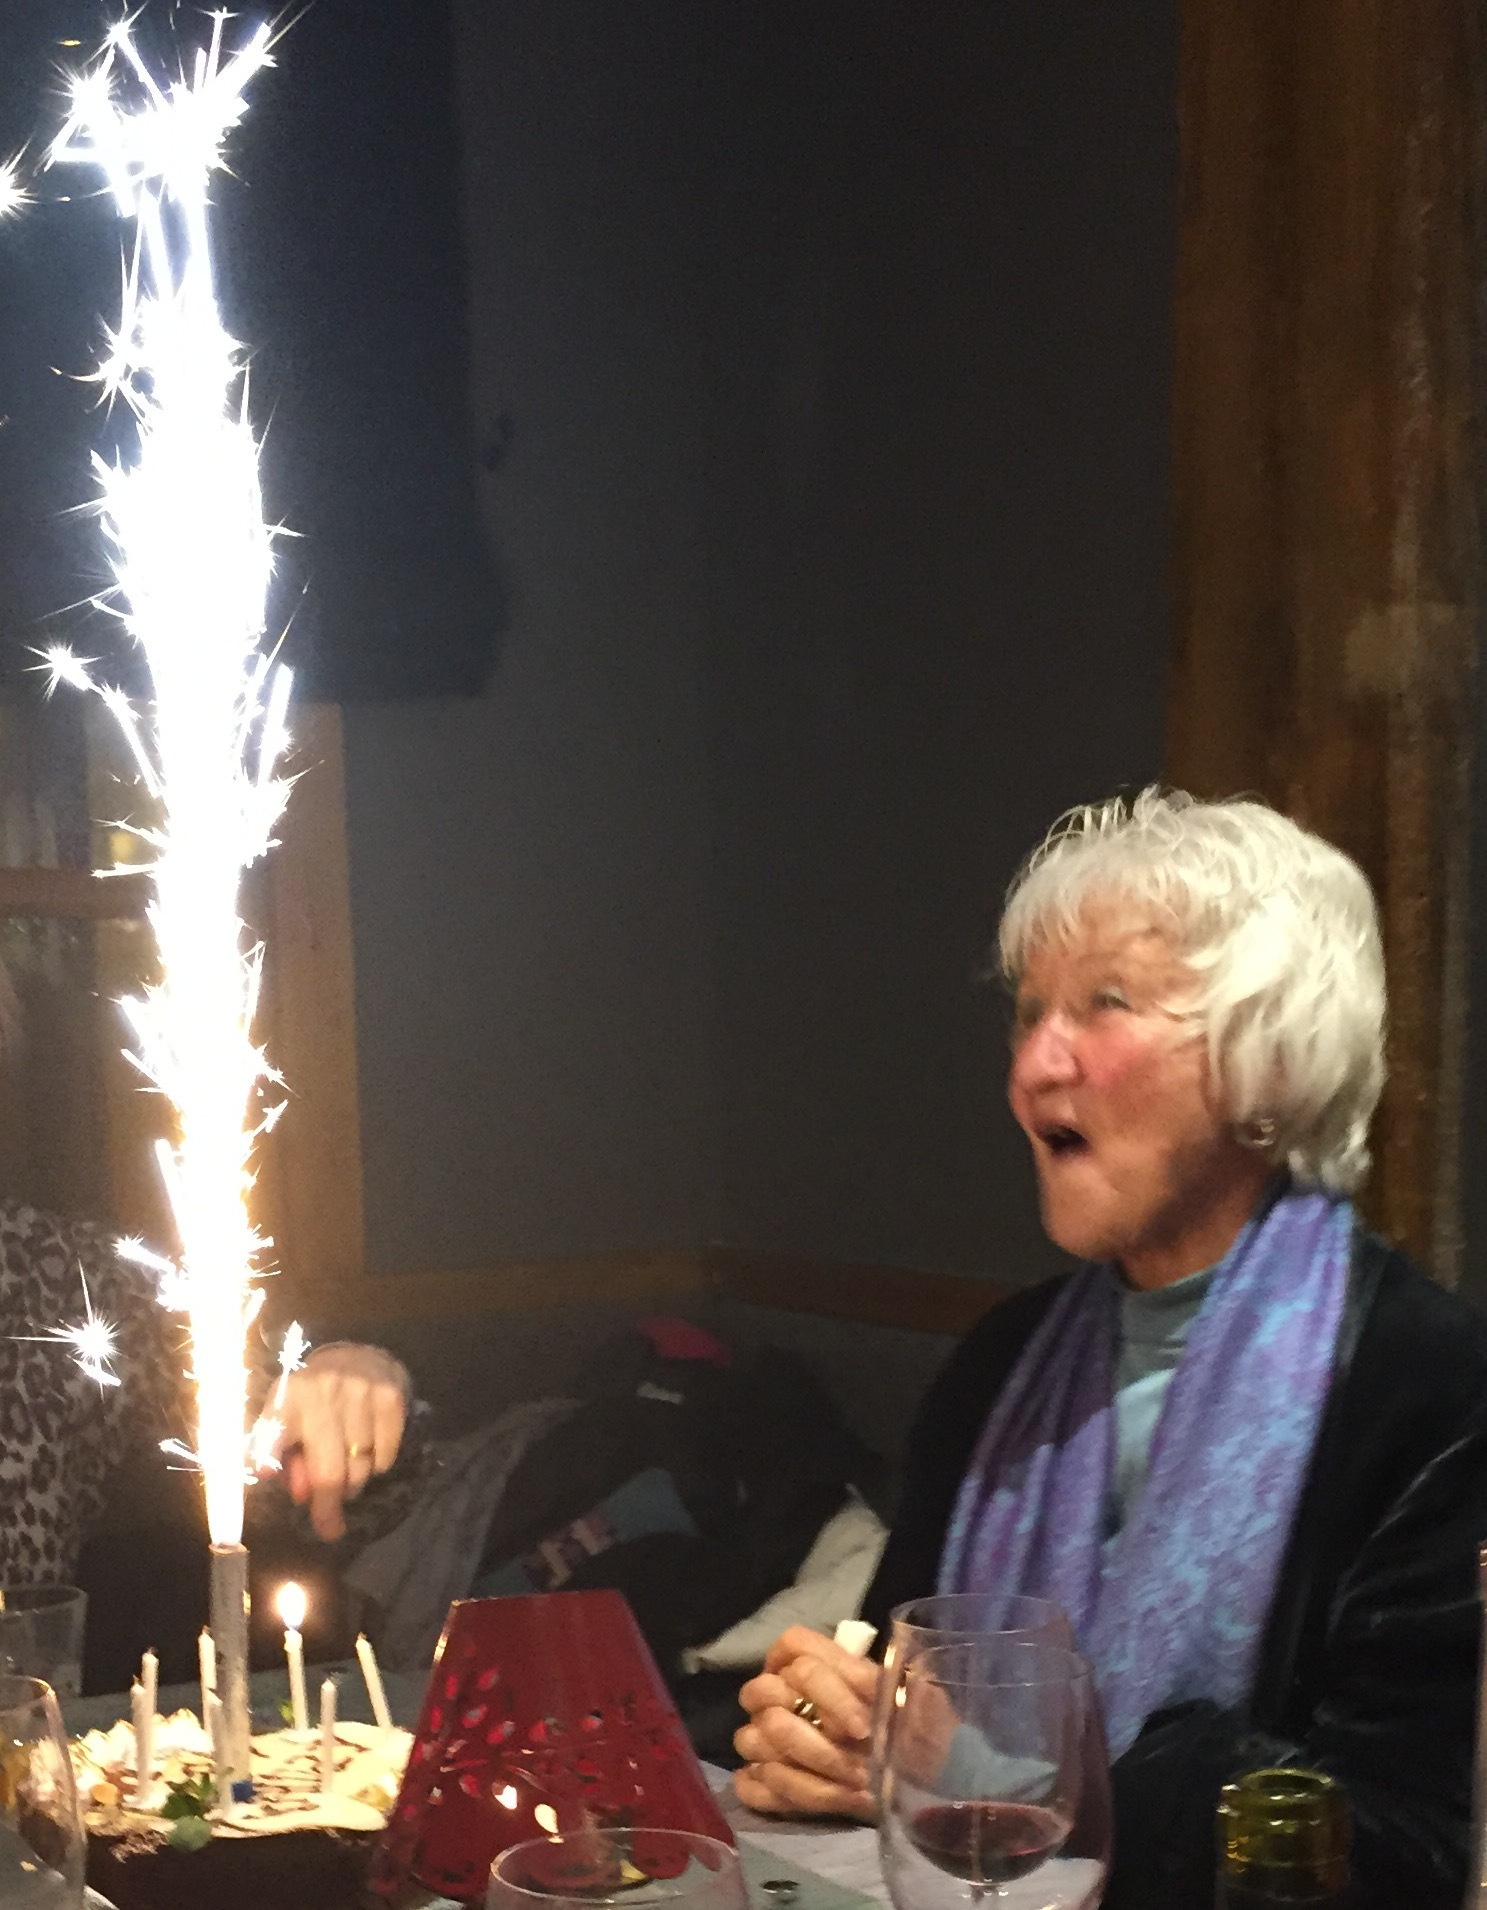 Elisabet with Cake